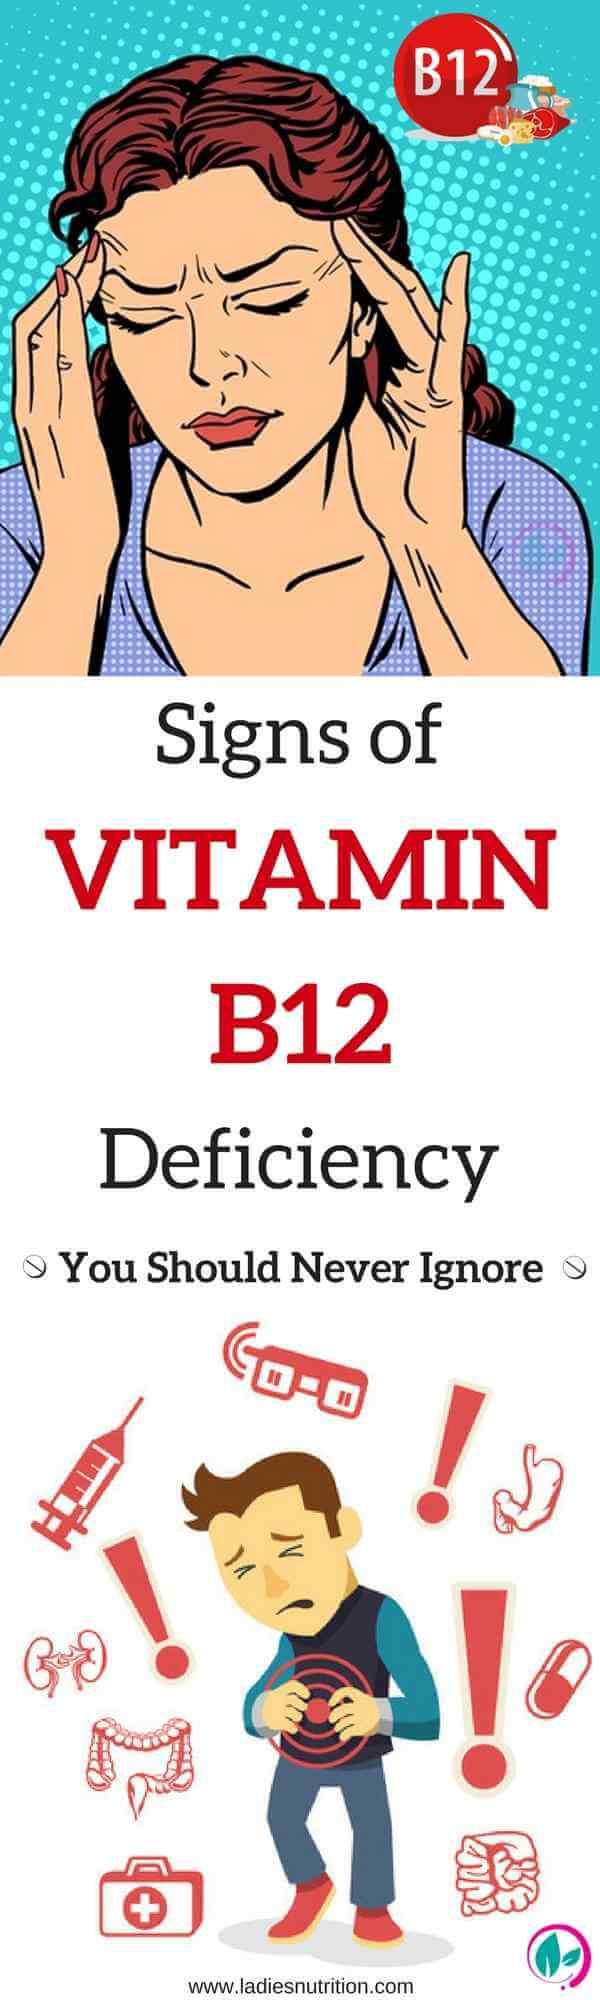 Vitamin B12 Deficiency Symptoms that Everyone Ignores B12 Deficiency Symptoms